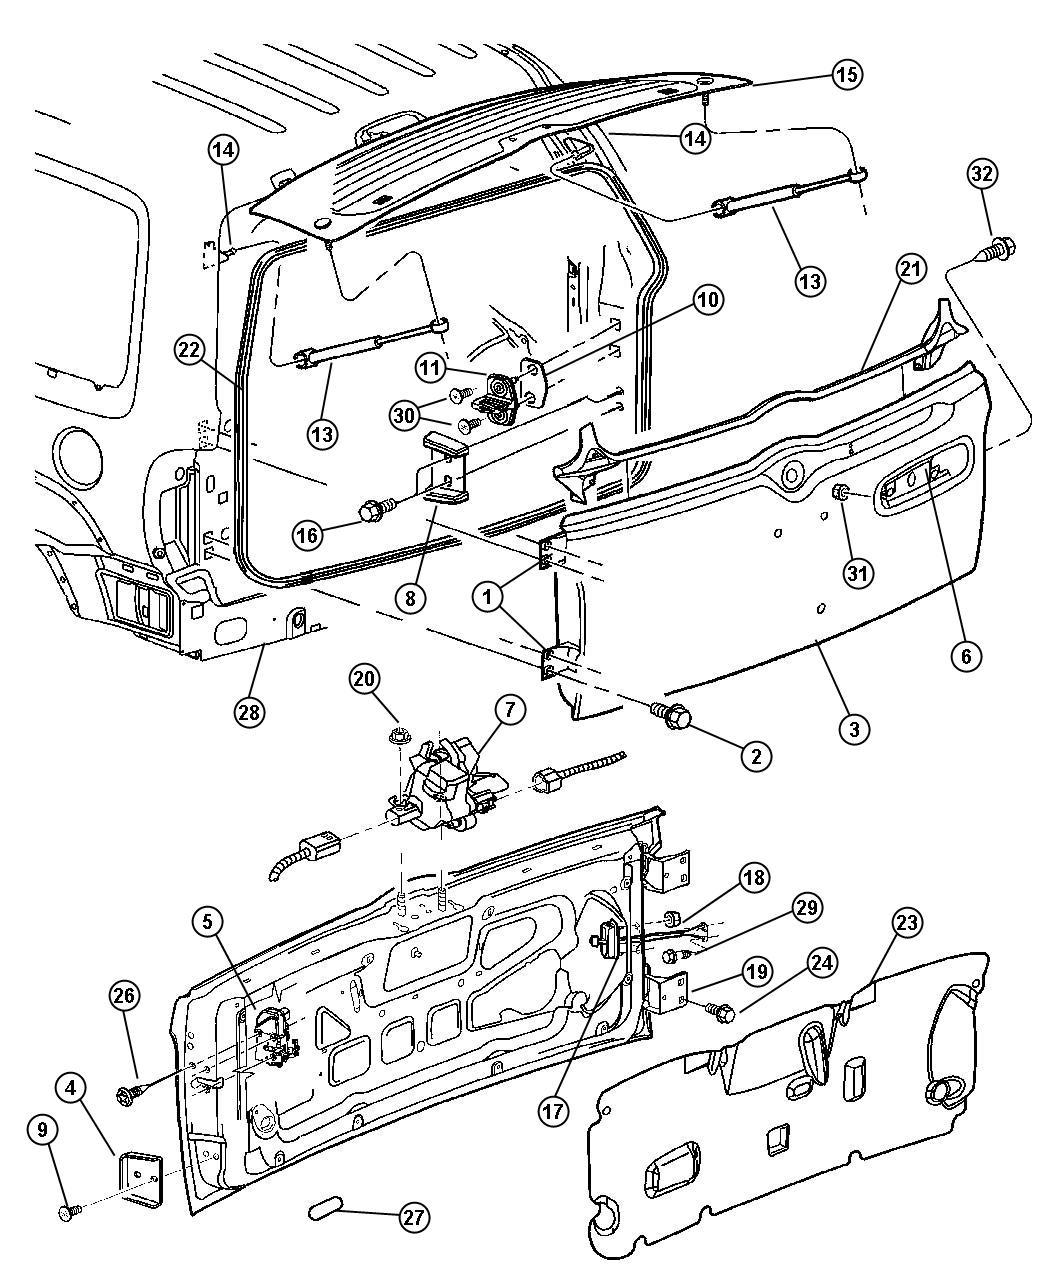 2005 jeep liberty wiring diagram iota emergency ballast parts door swing imageresizertool com